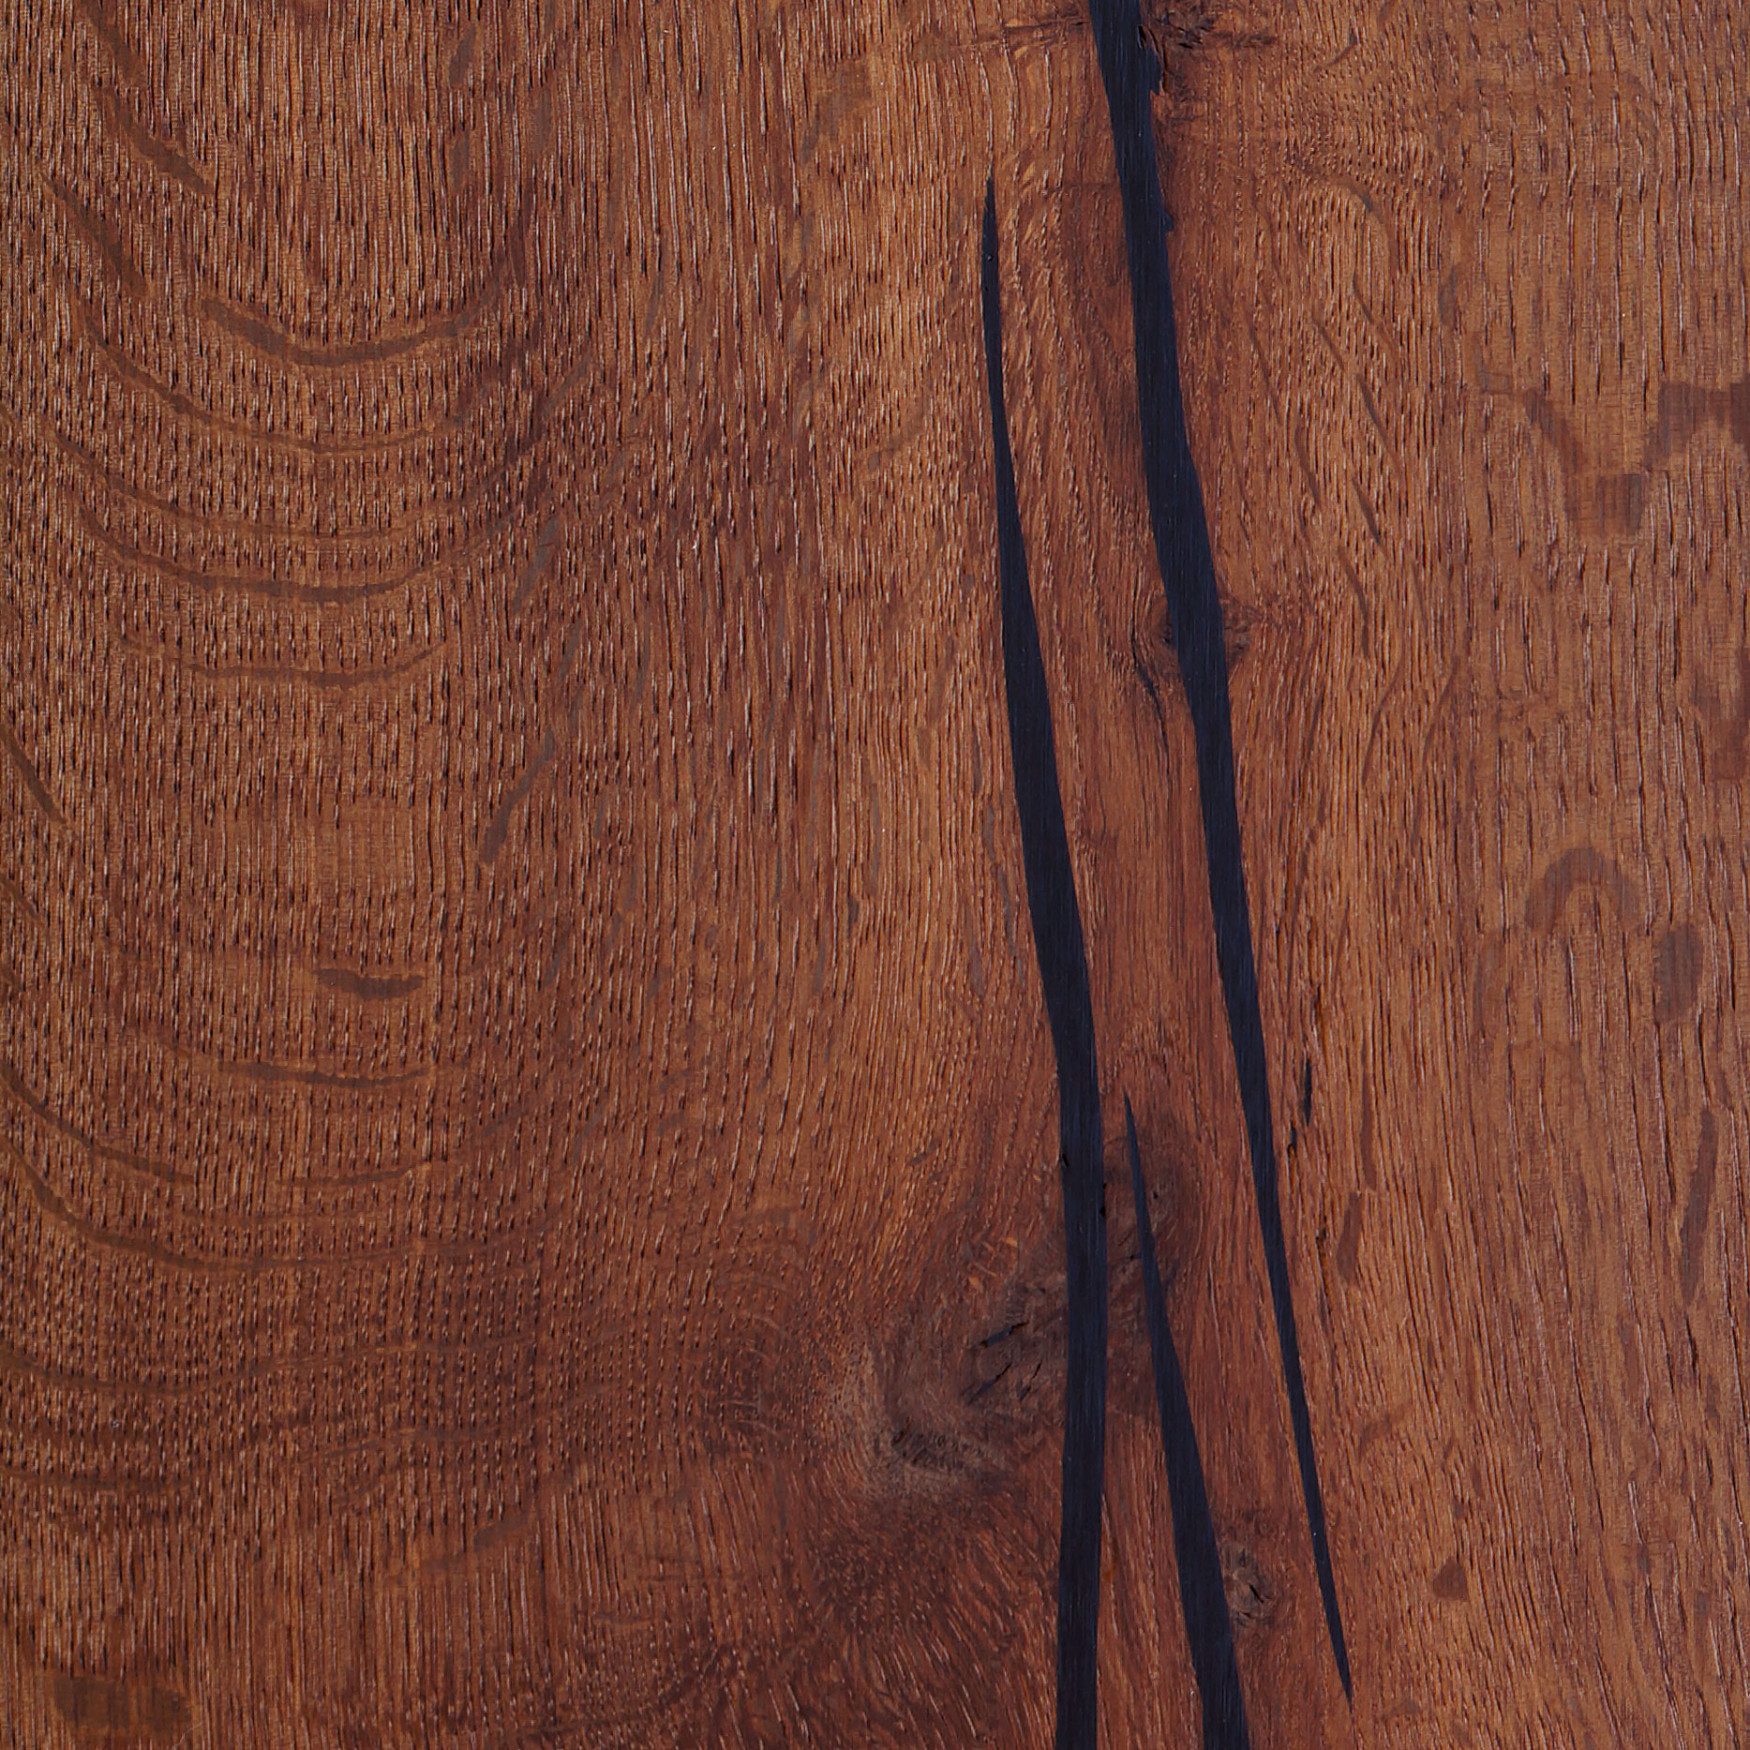 Element7-wide-plank-samples-AJ_562_523_CoralBlack